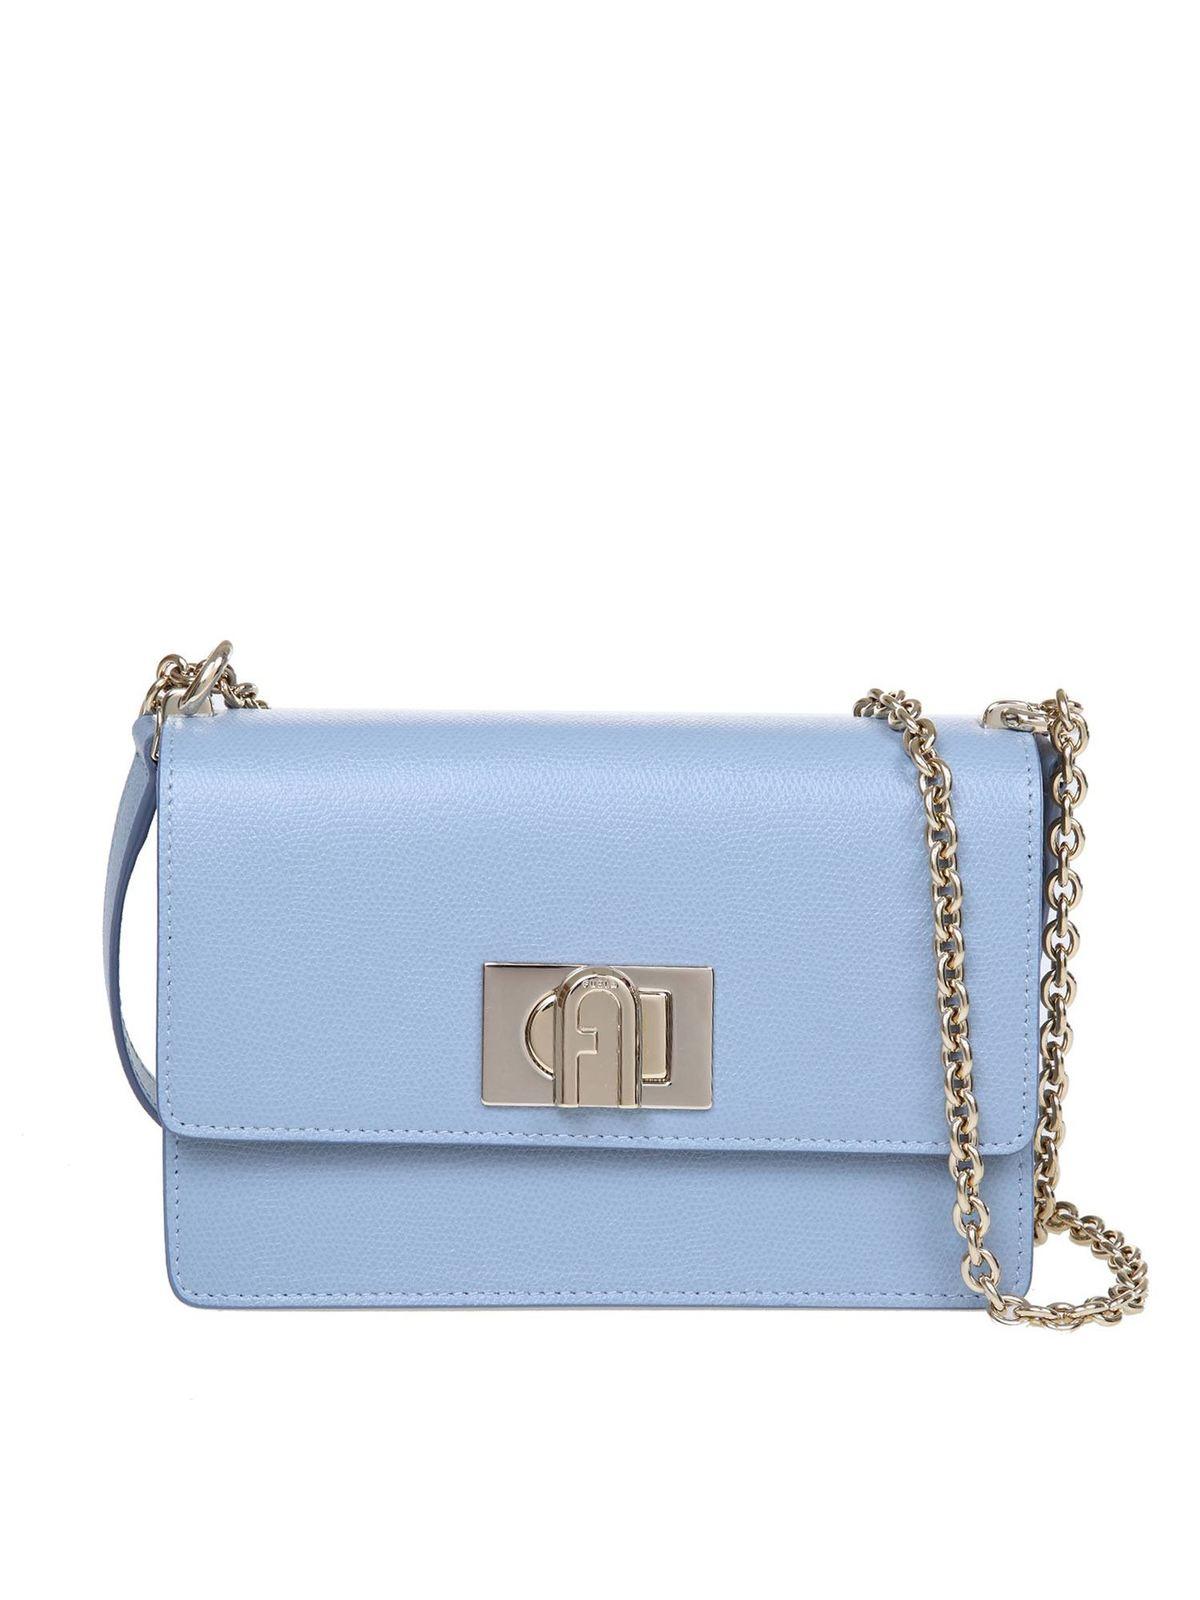 Furla Leathers 1927 MINI CROSSBODY BAG IN LIGHT BLUE